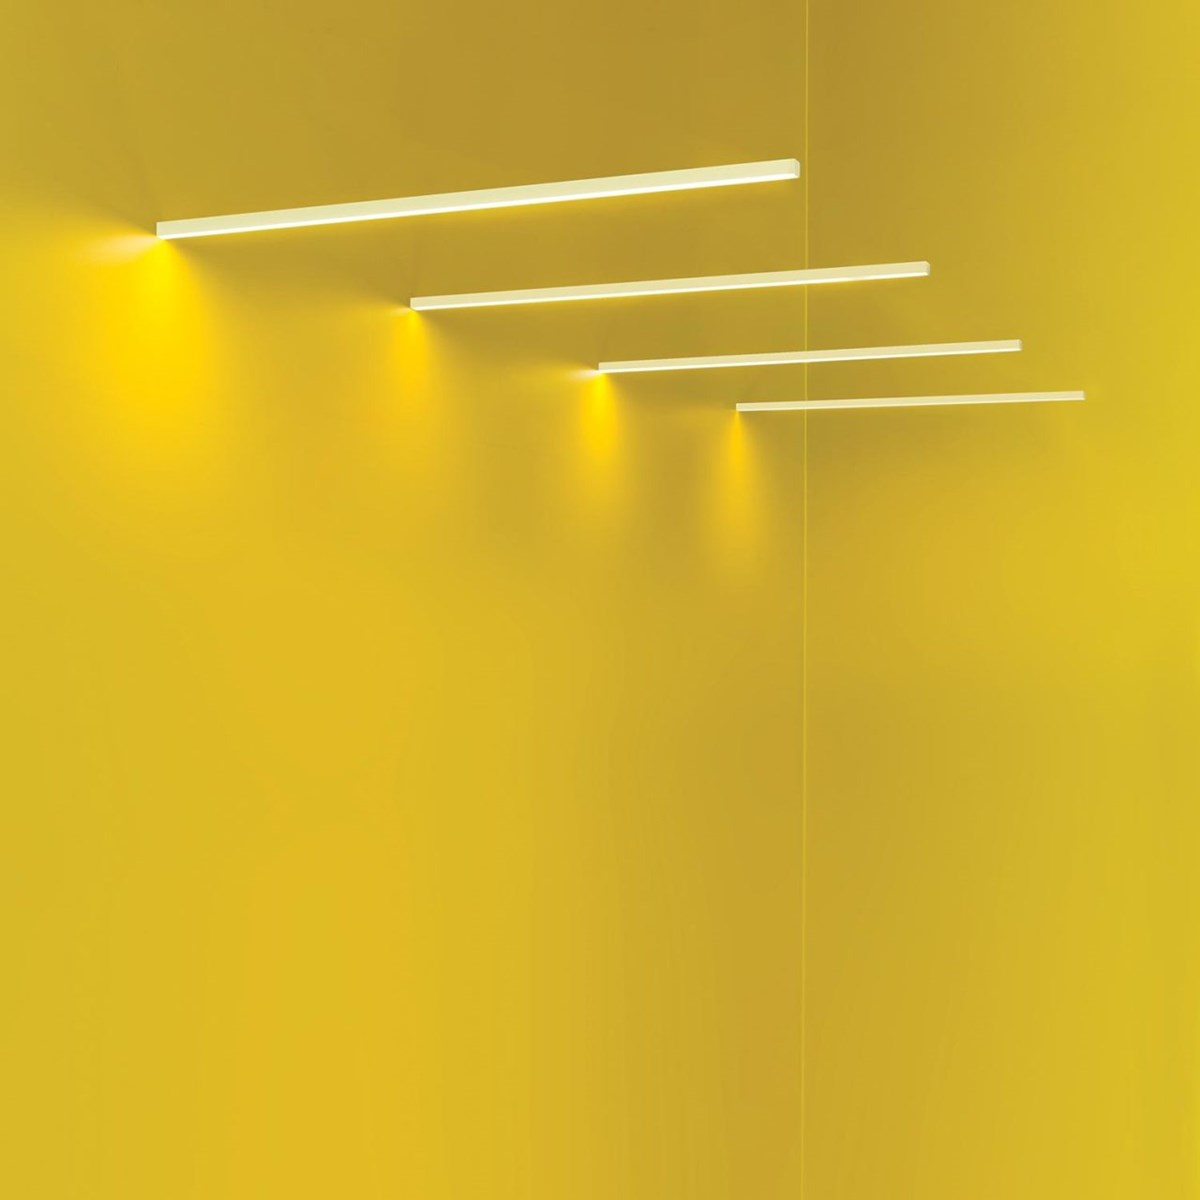 Nemo-Nemo-Design-Linescapes-Cantilevered-Light-Matisse-5